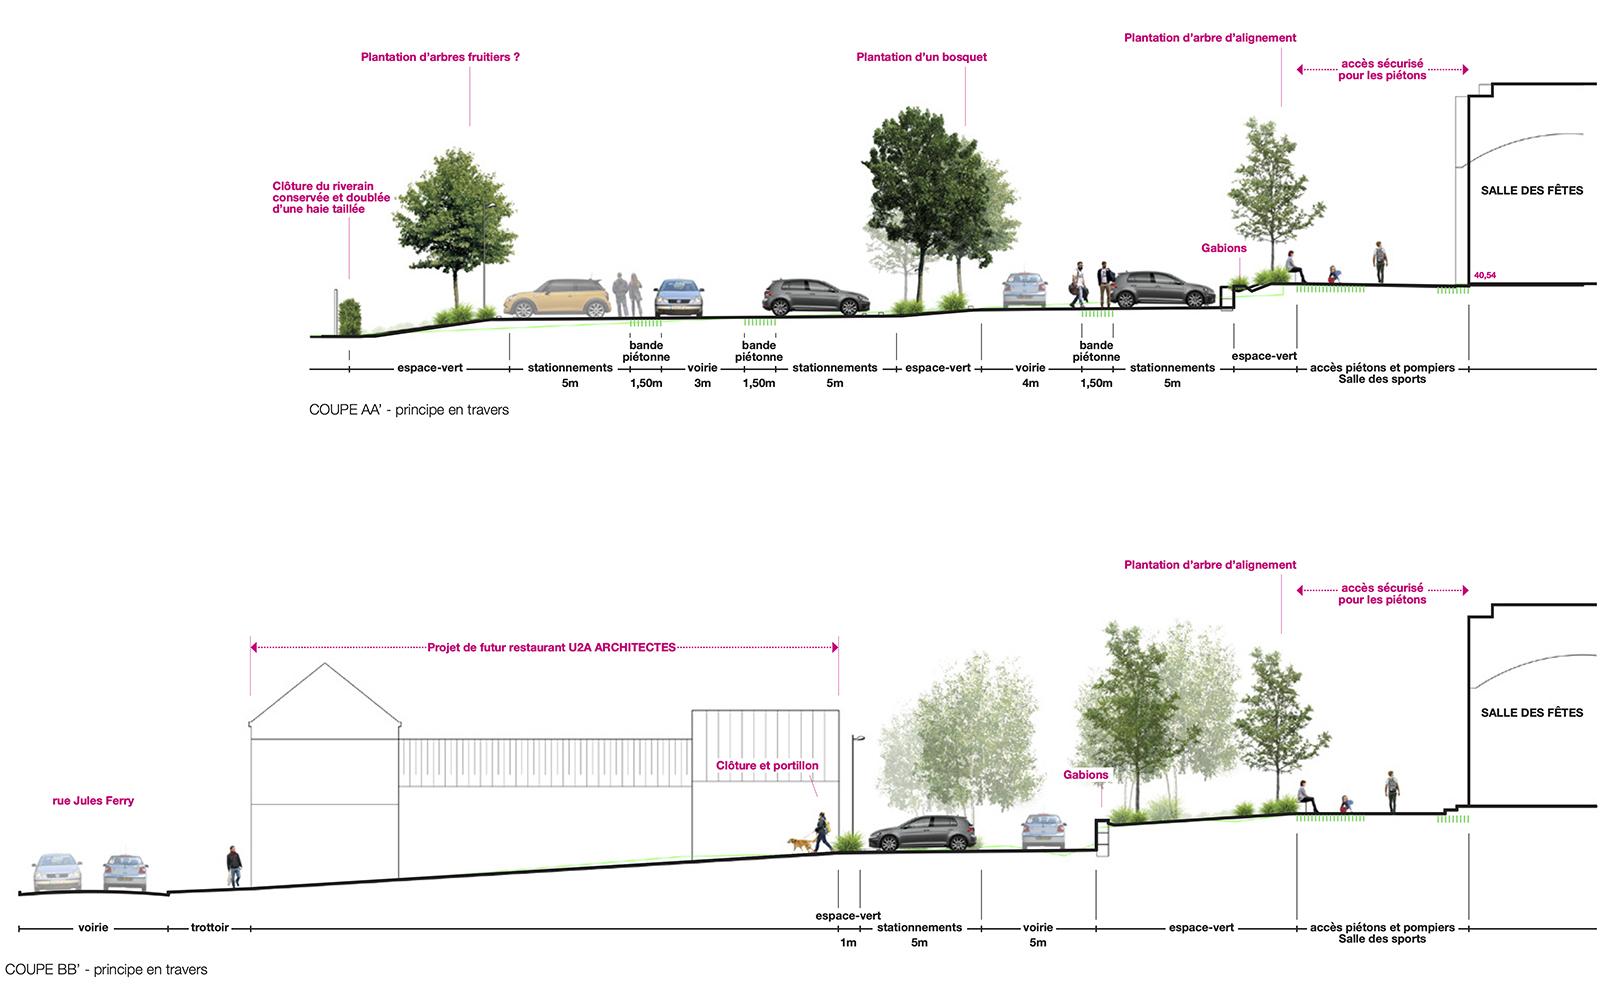 coupe principe aménagement urbain paysager centre raimbeaucourt gabions